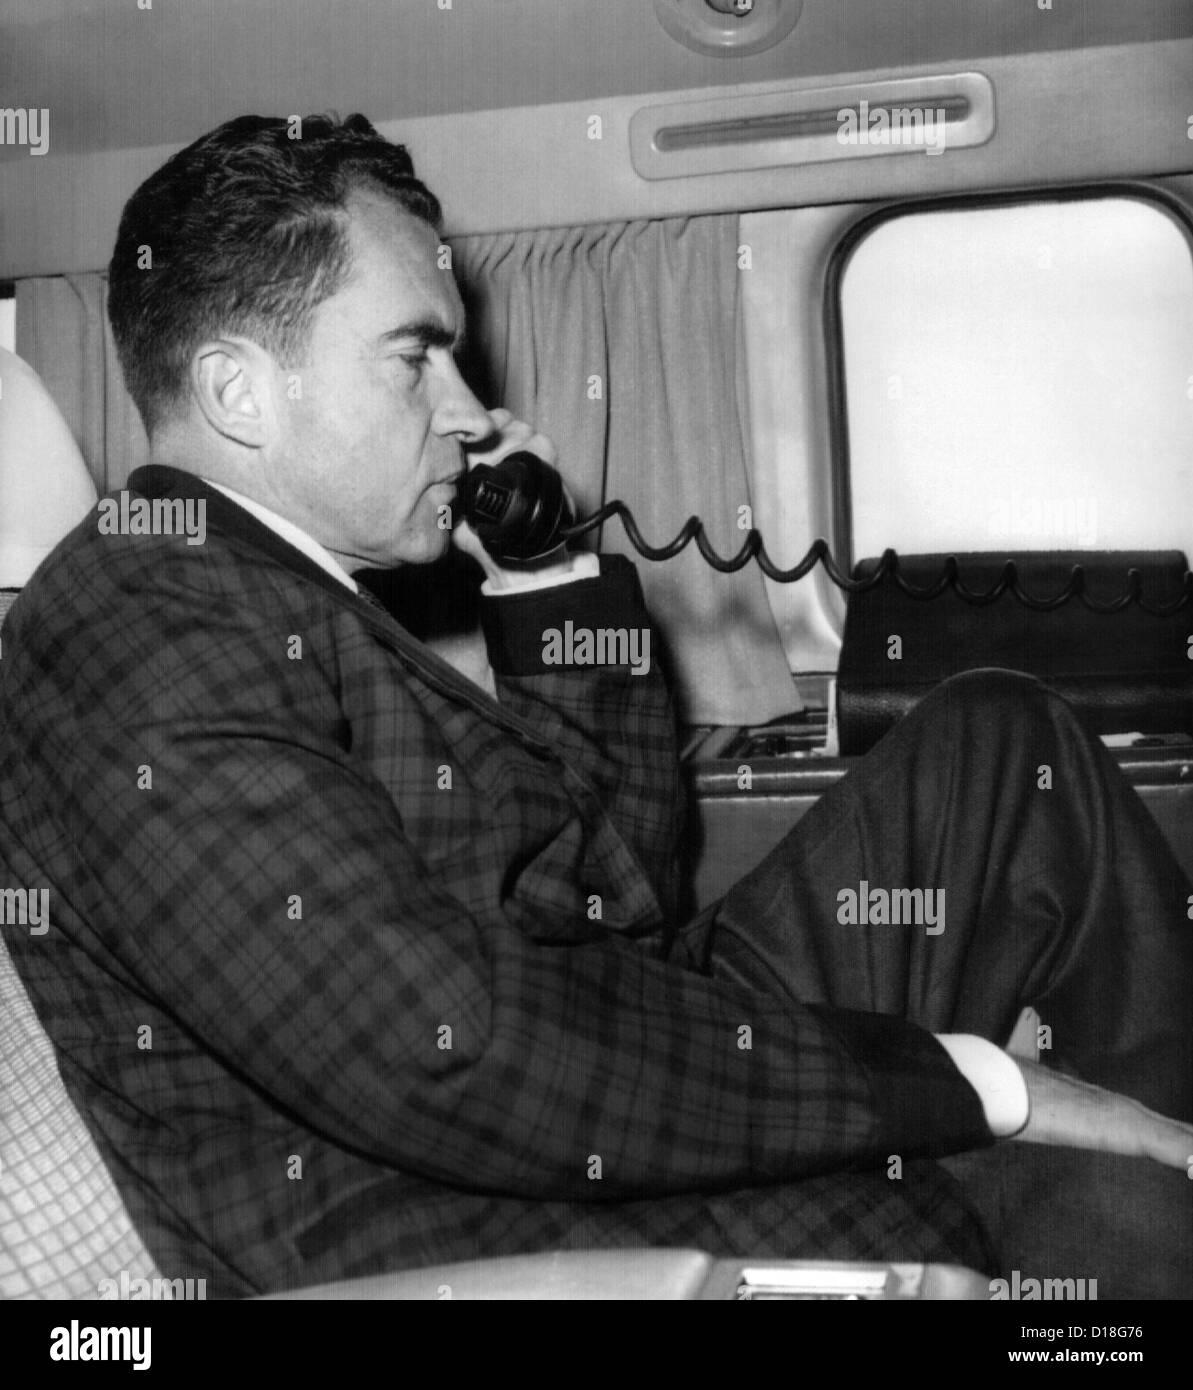 Vice President Richard Nixon uses his plane's radiotelephone while enroute from Quito, Ecuador to Bogota, Columbia. - Stock Image